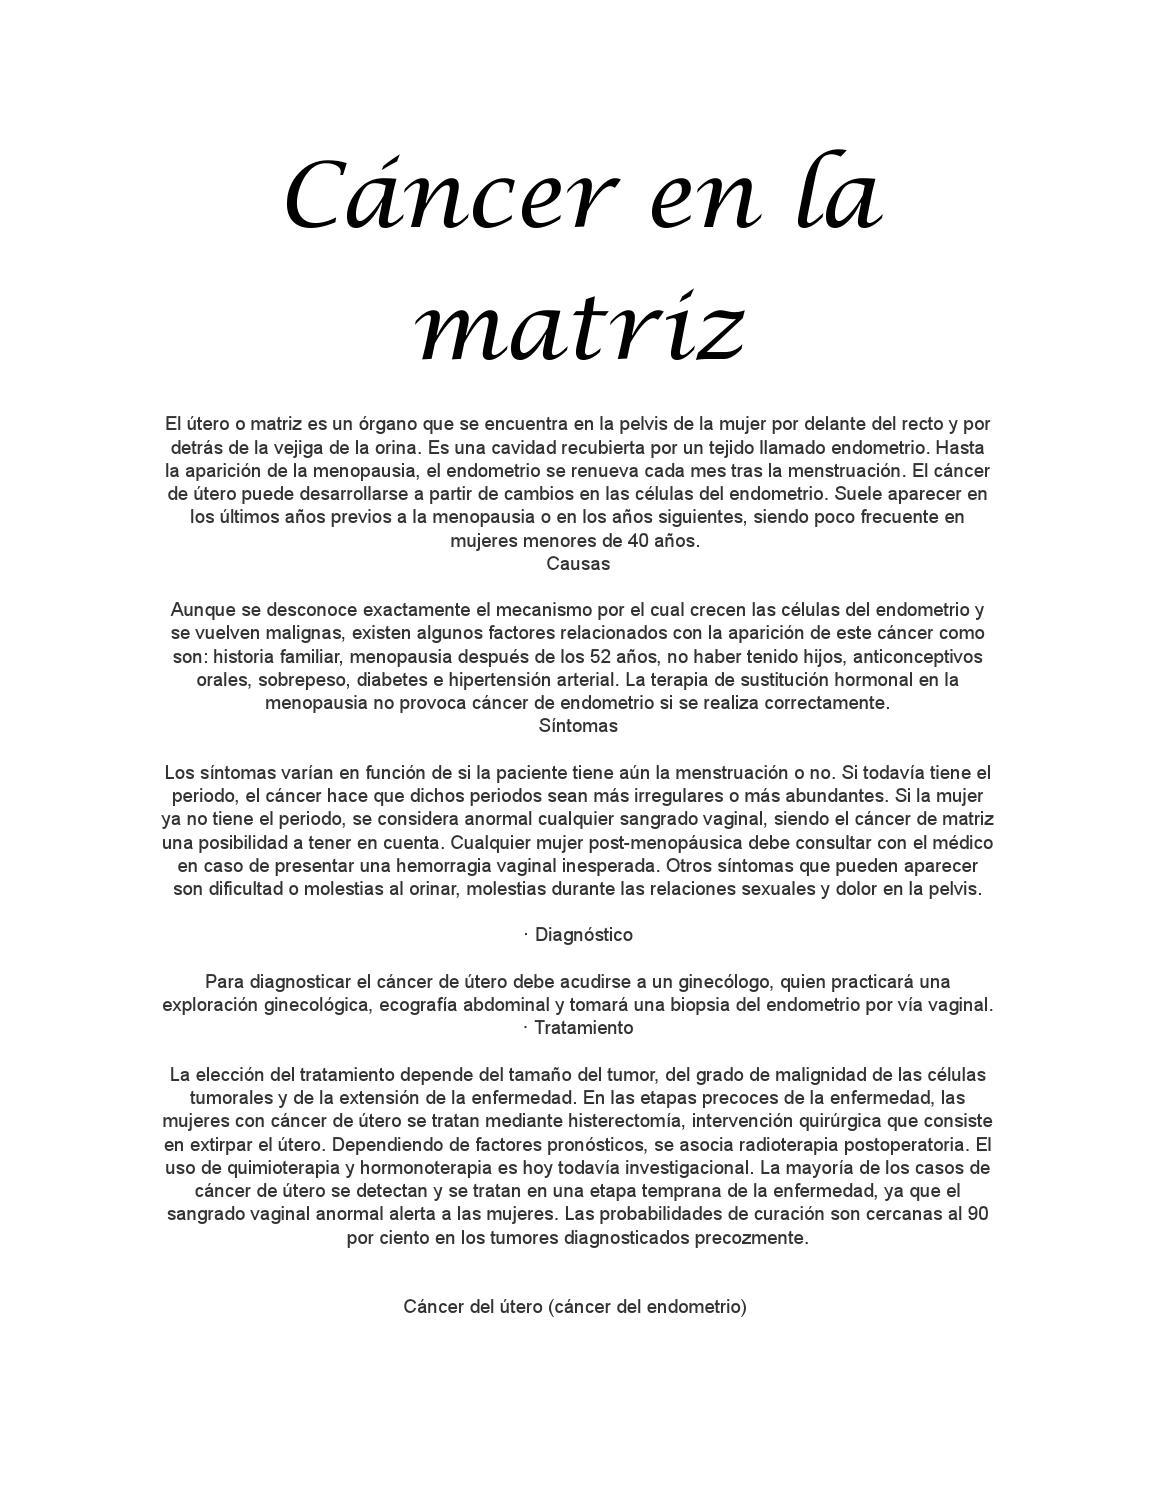 Cáncer En La Matriz By Edifer Issuu